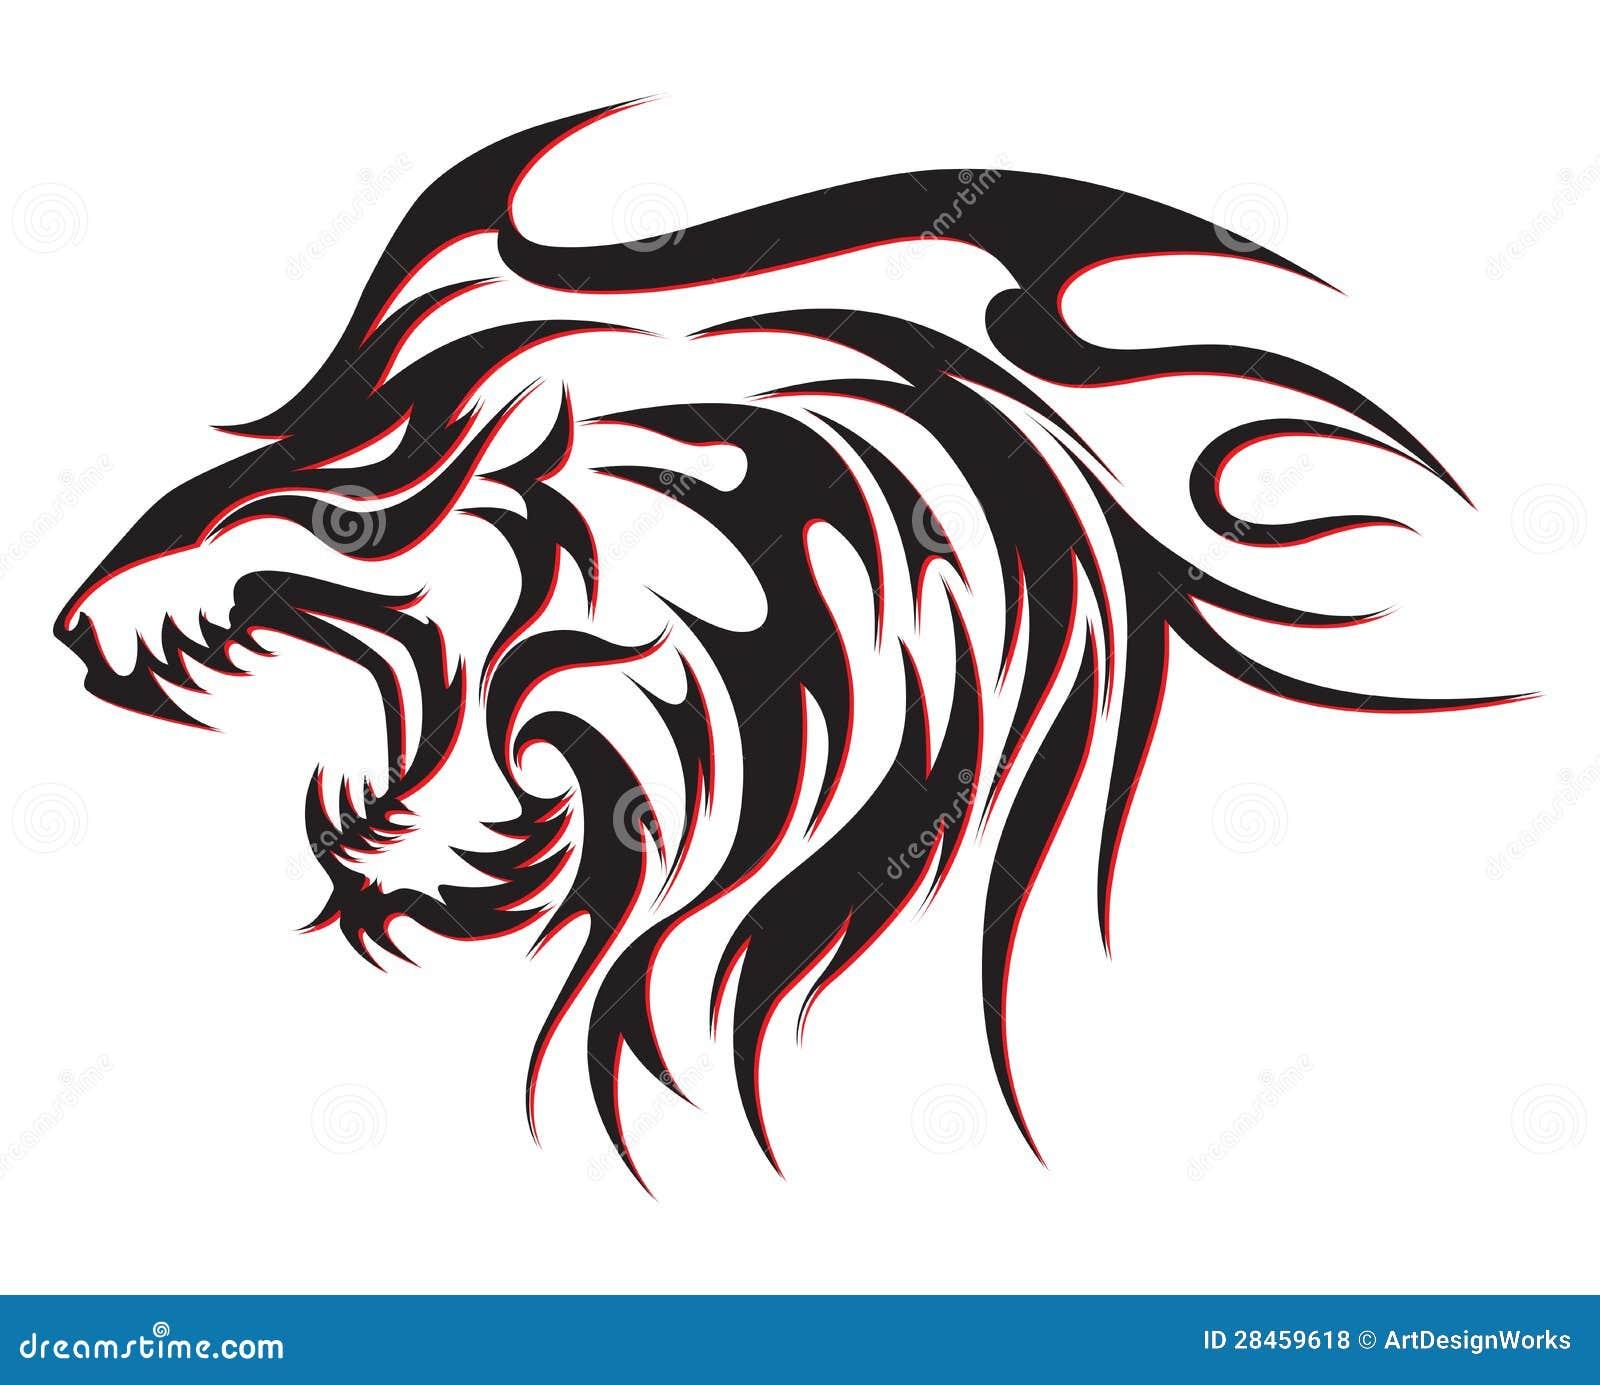 Tatuagem de Tribalwolf